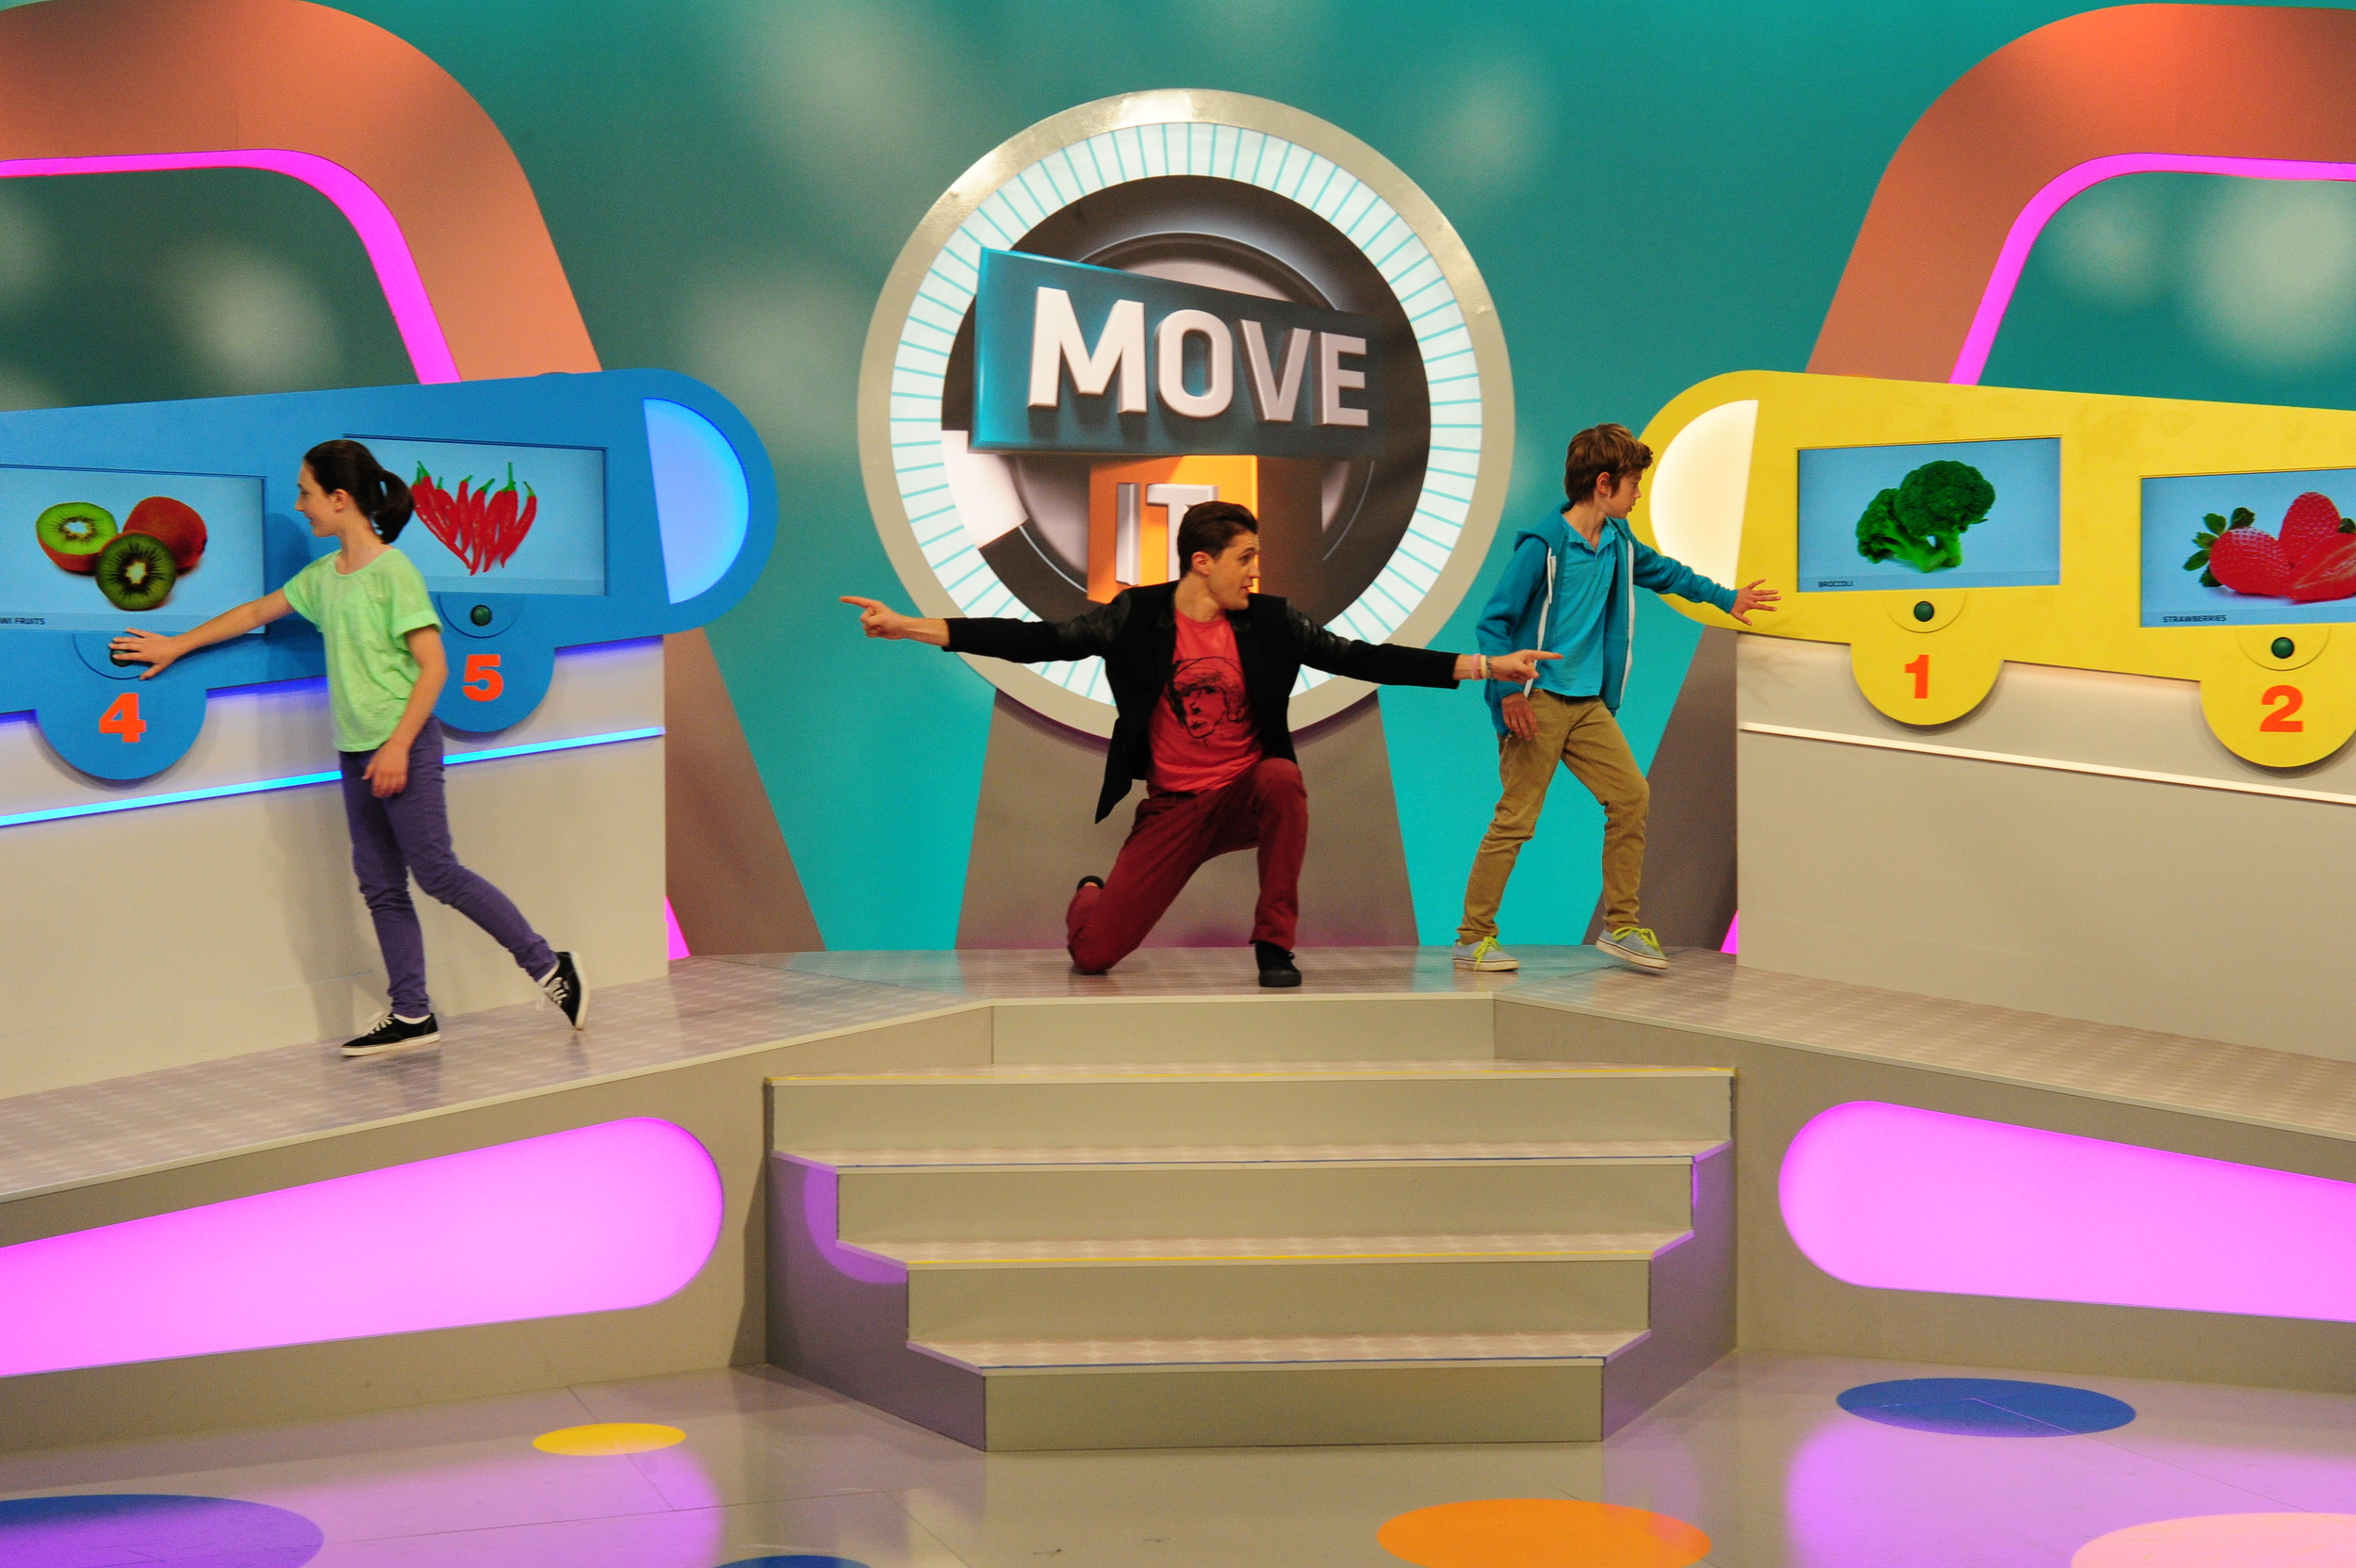 Move_It_Set_Still_6-ID-8f8aa9b8-7b1c-419b-a98e-7c8c878575f1.jpg